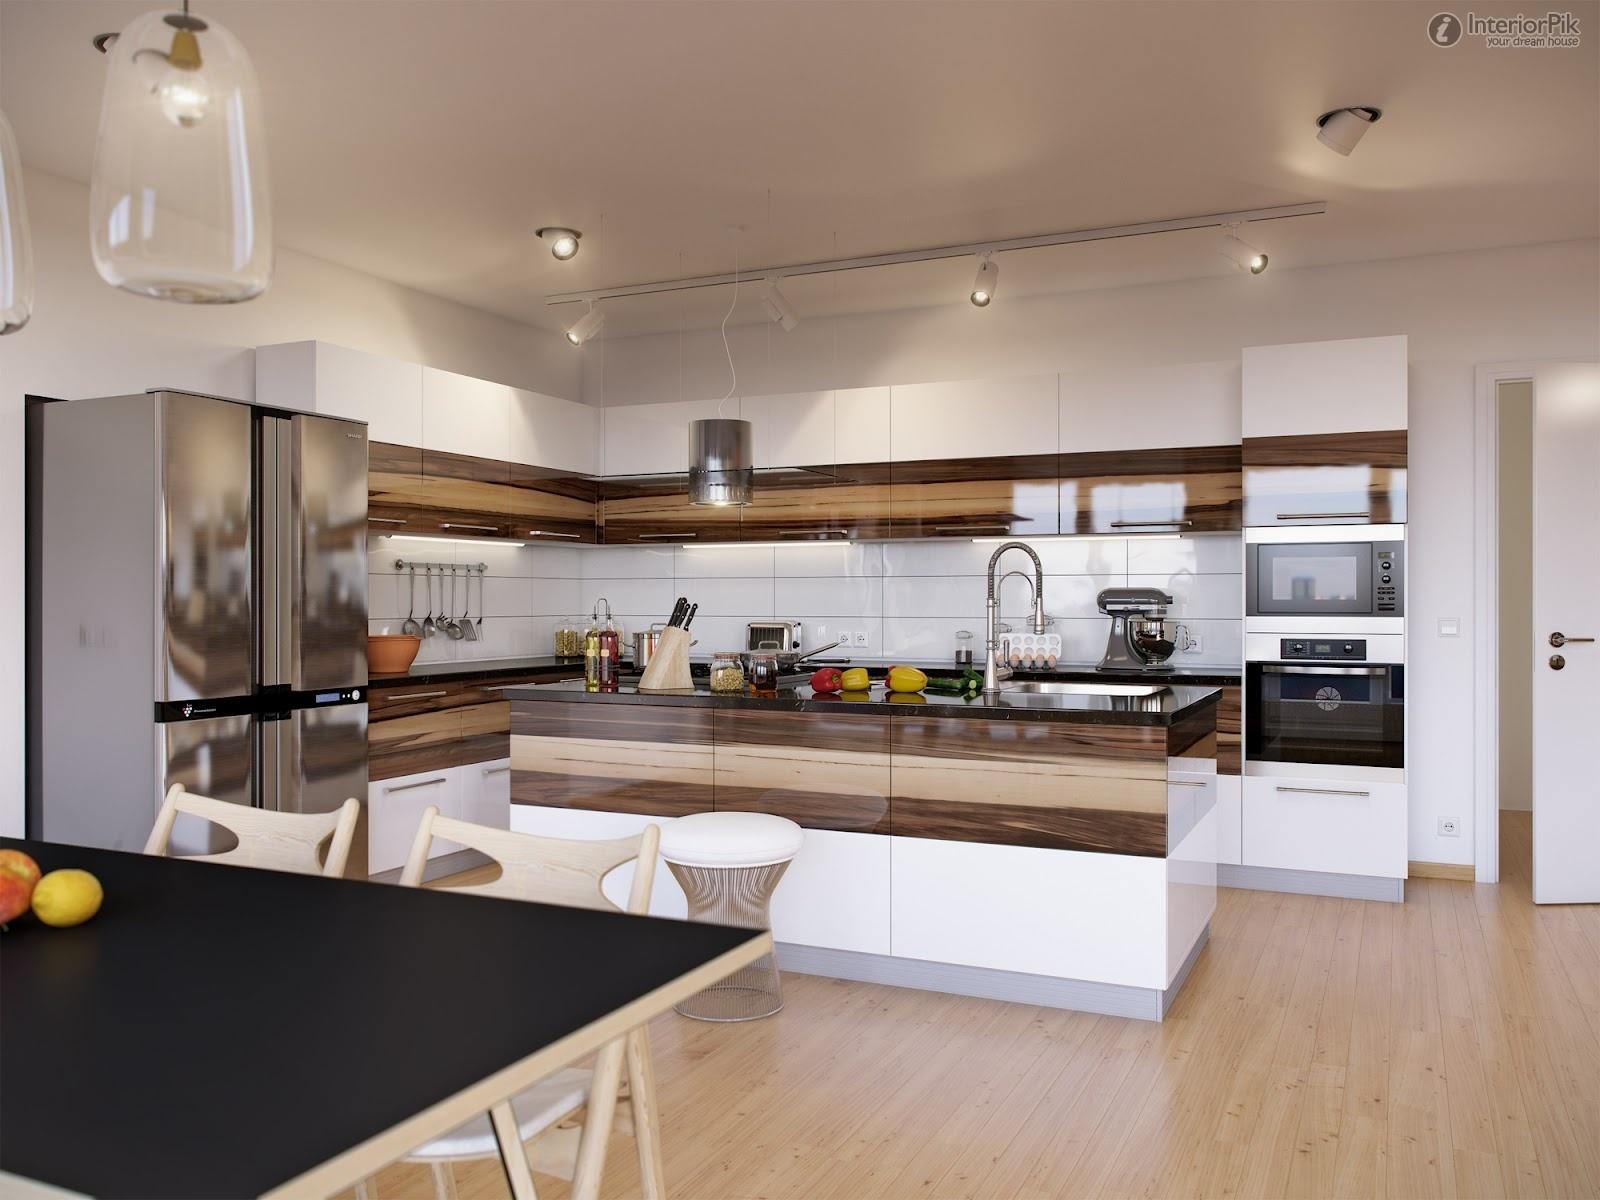 small kitchen inspiration photo - 1